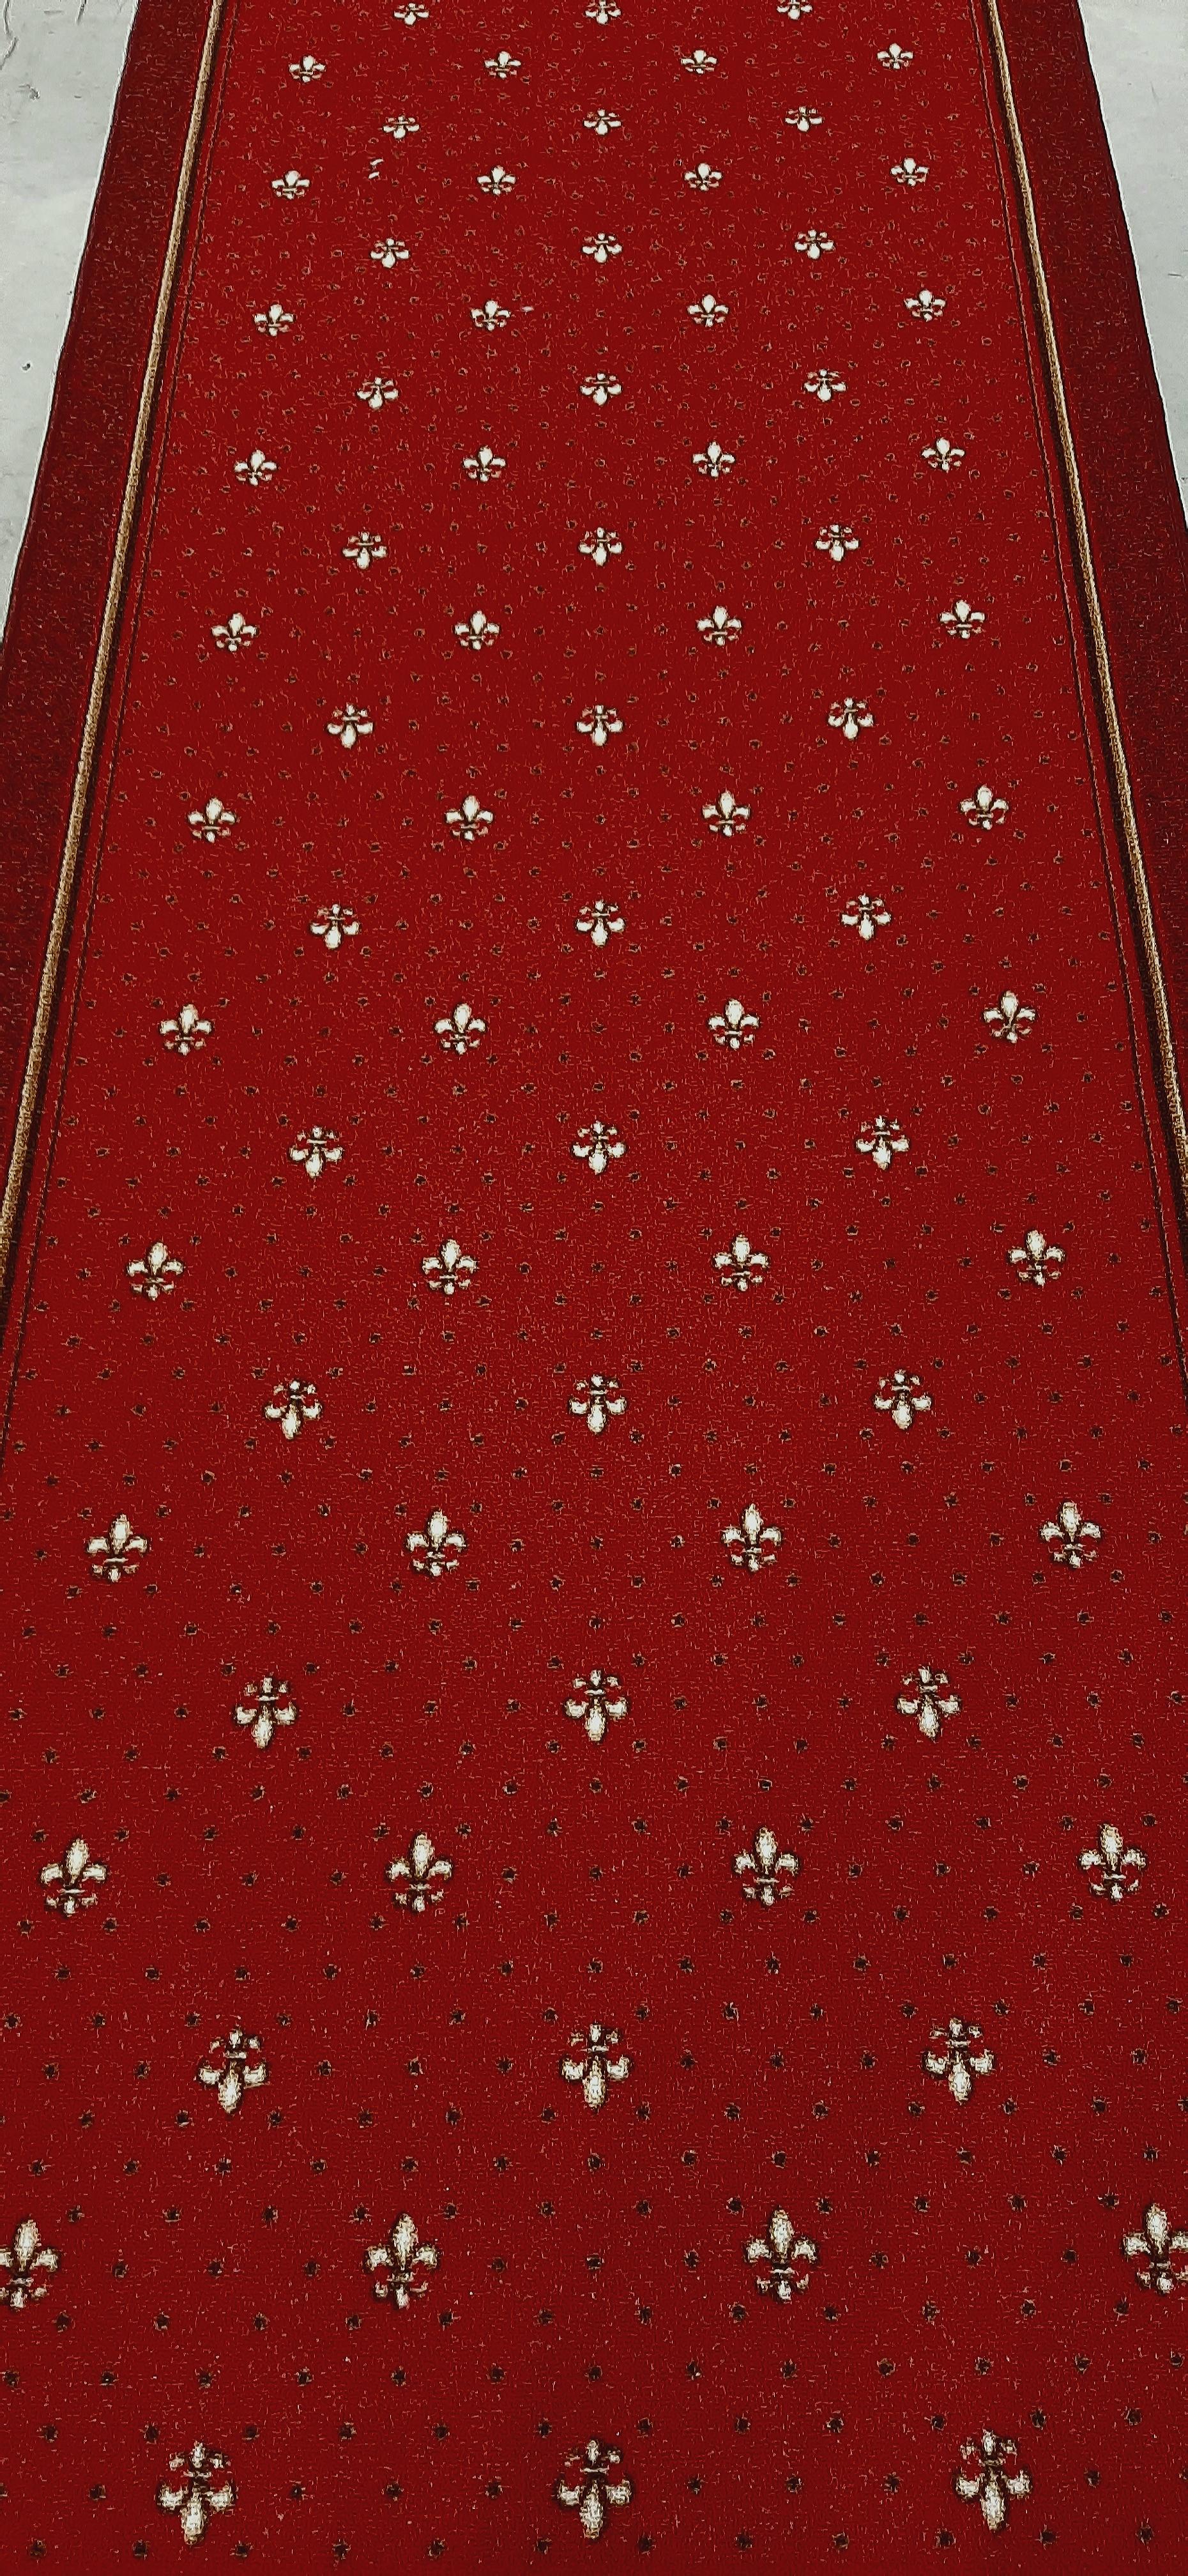 Traversa Tesatura Plata 1835, Rosu, 100x2000 cm, 820 gr/mp 8